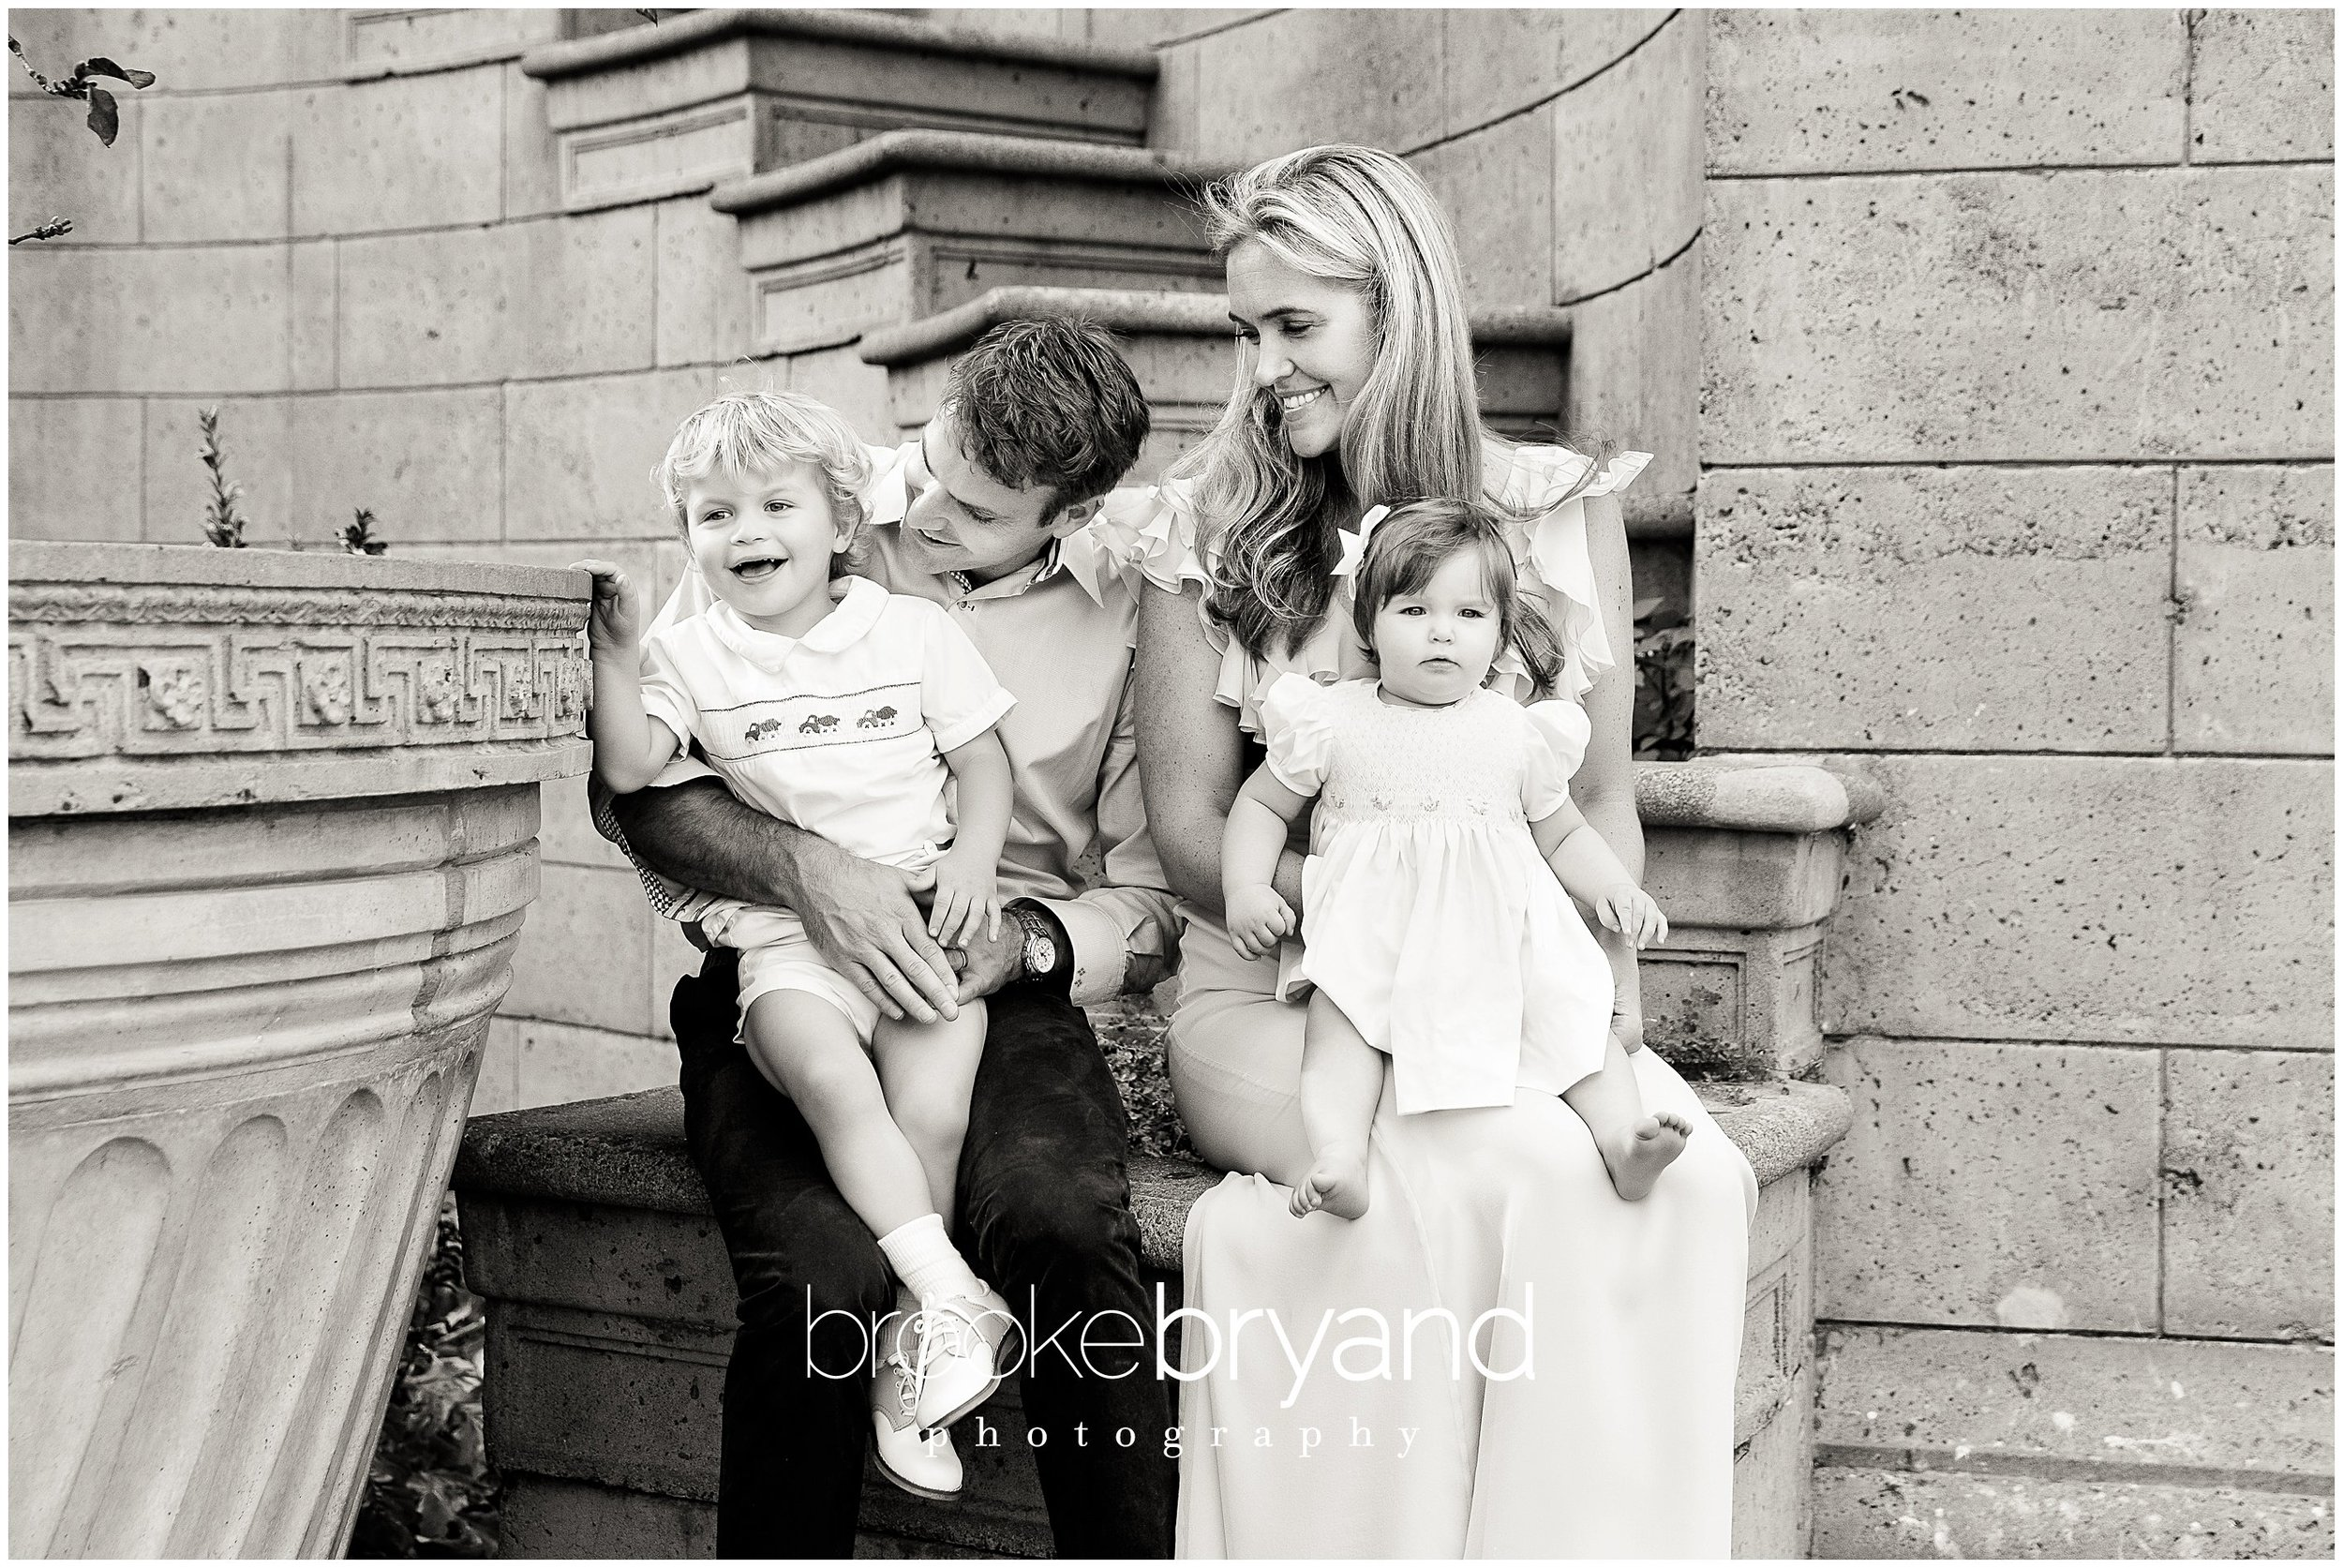 08.2014-Butler-BBP_4212_retouch1_San-Francisco-Family-Photos-Brooke-Bryand-Photography.jpg